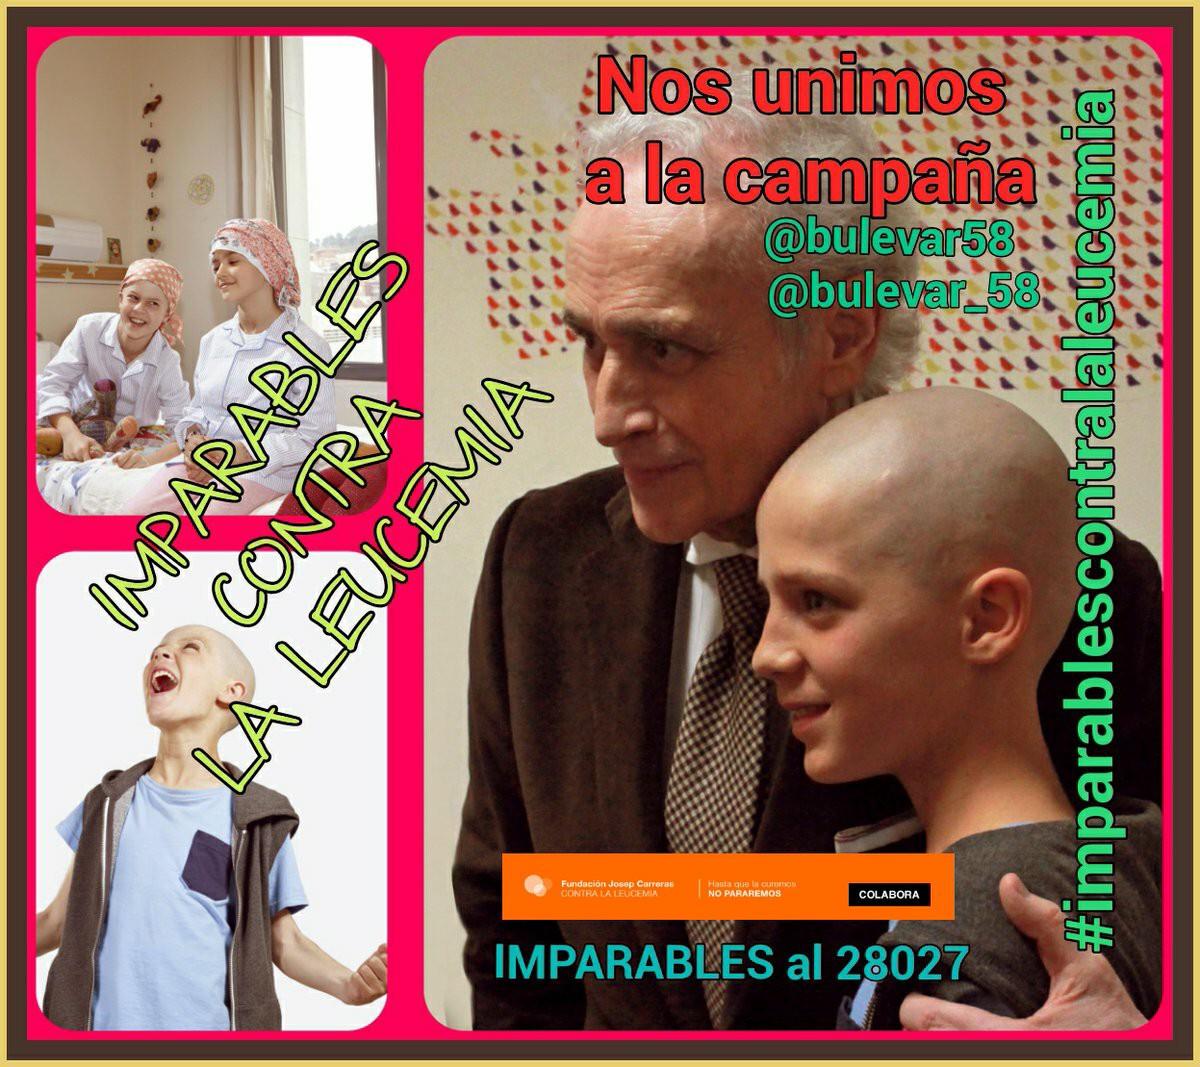 CAMPAÑA FUNDACIÓN JOSEP CARRERAS